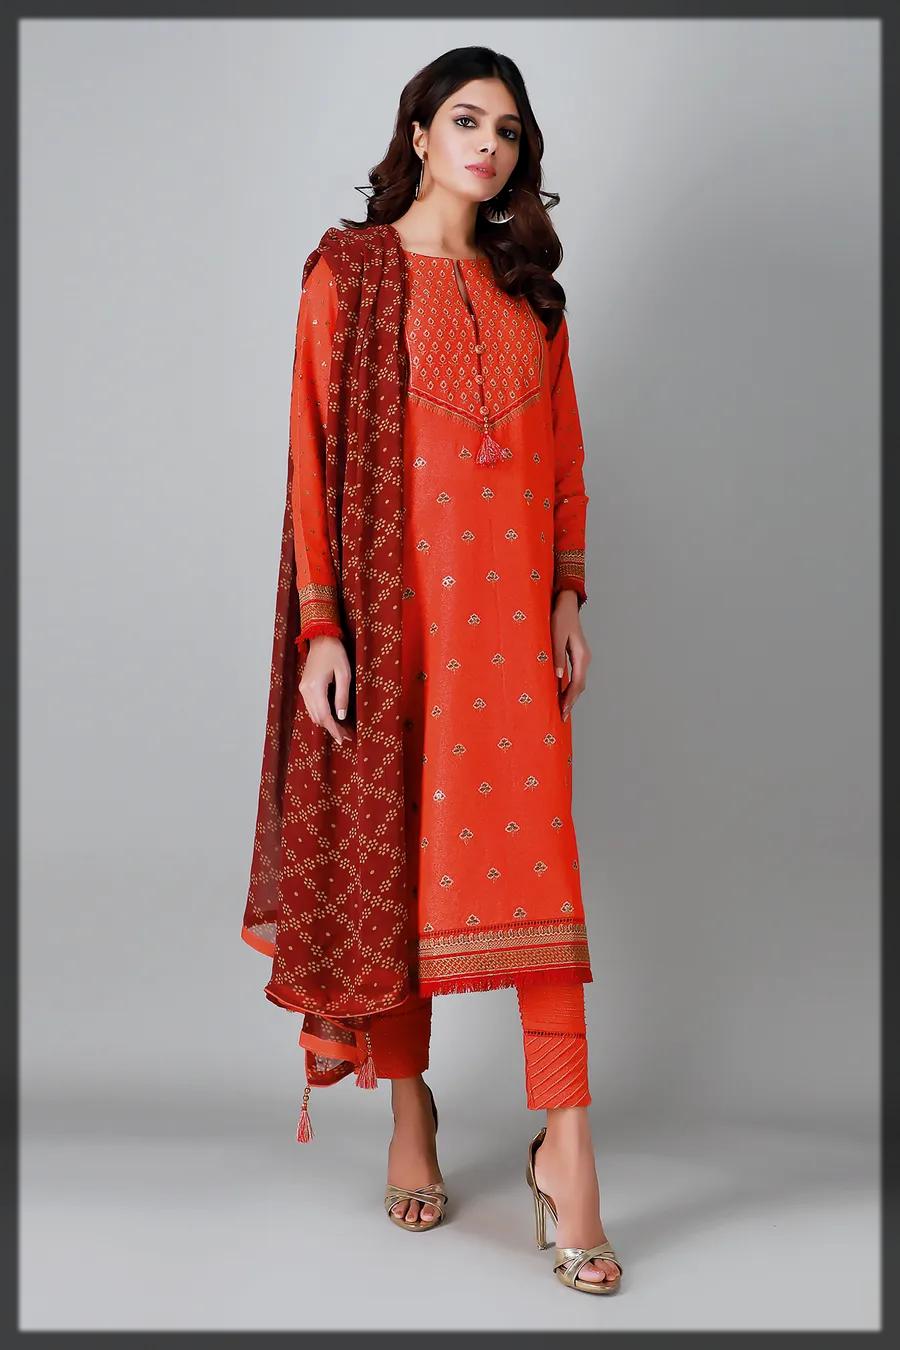 dazzling khaadi winter dress